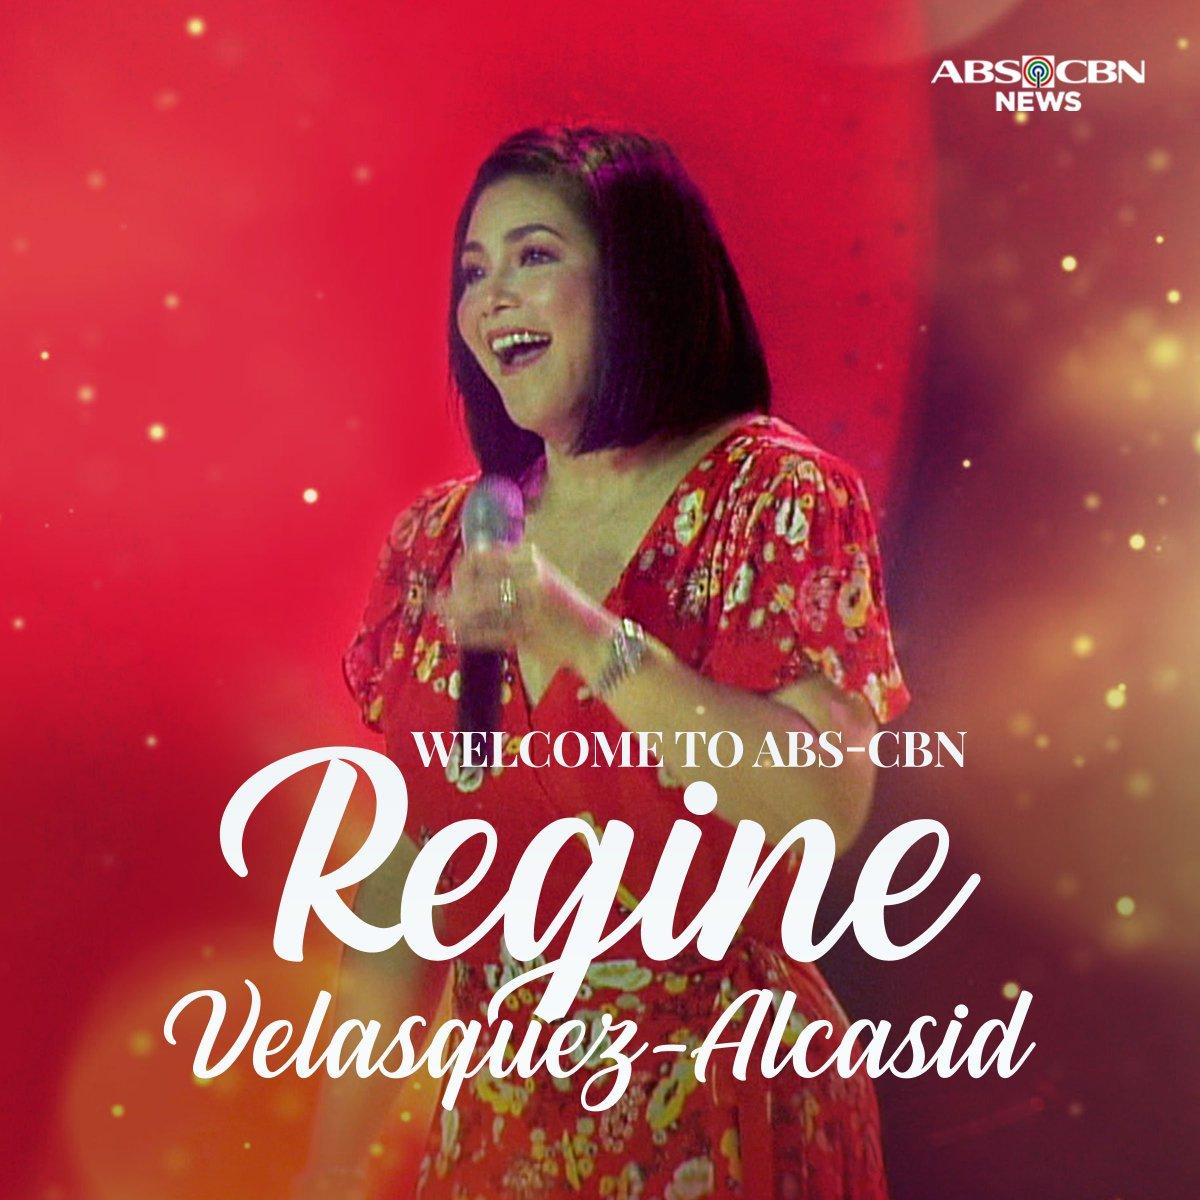 @mjfelipe The Asia's Songbird has found her way back home. Welcome to the Kapamilya network, Regine Velasquez-Alcasid! #SongbirdReturnsToABSCBN  https://t